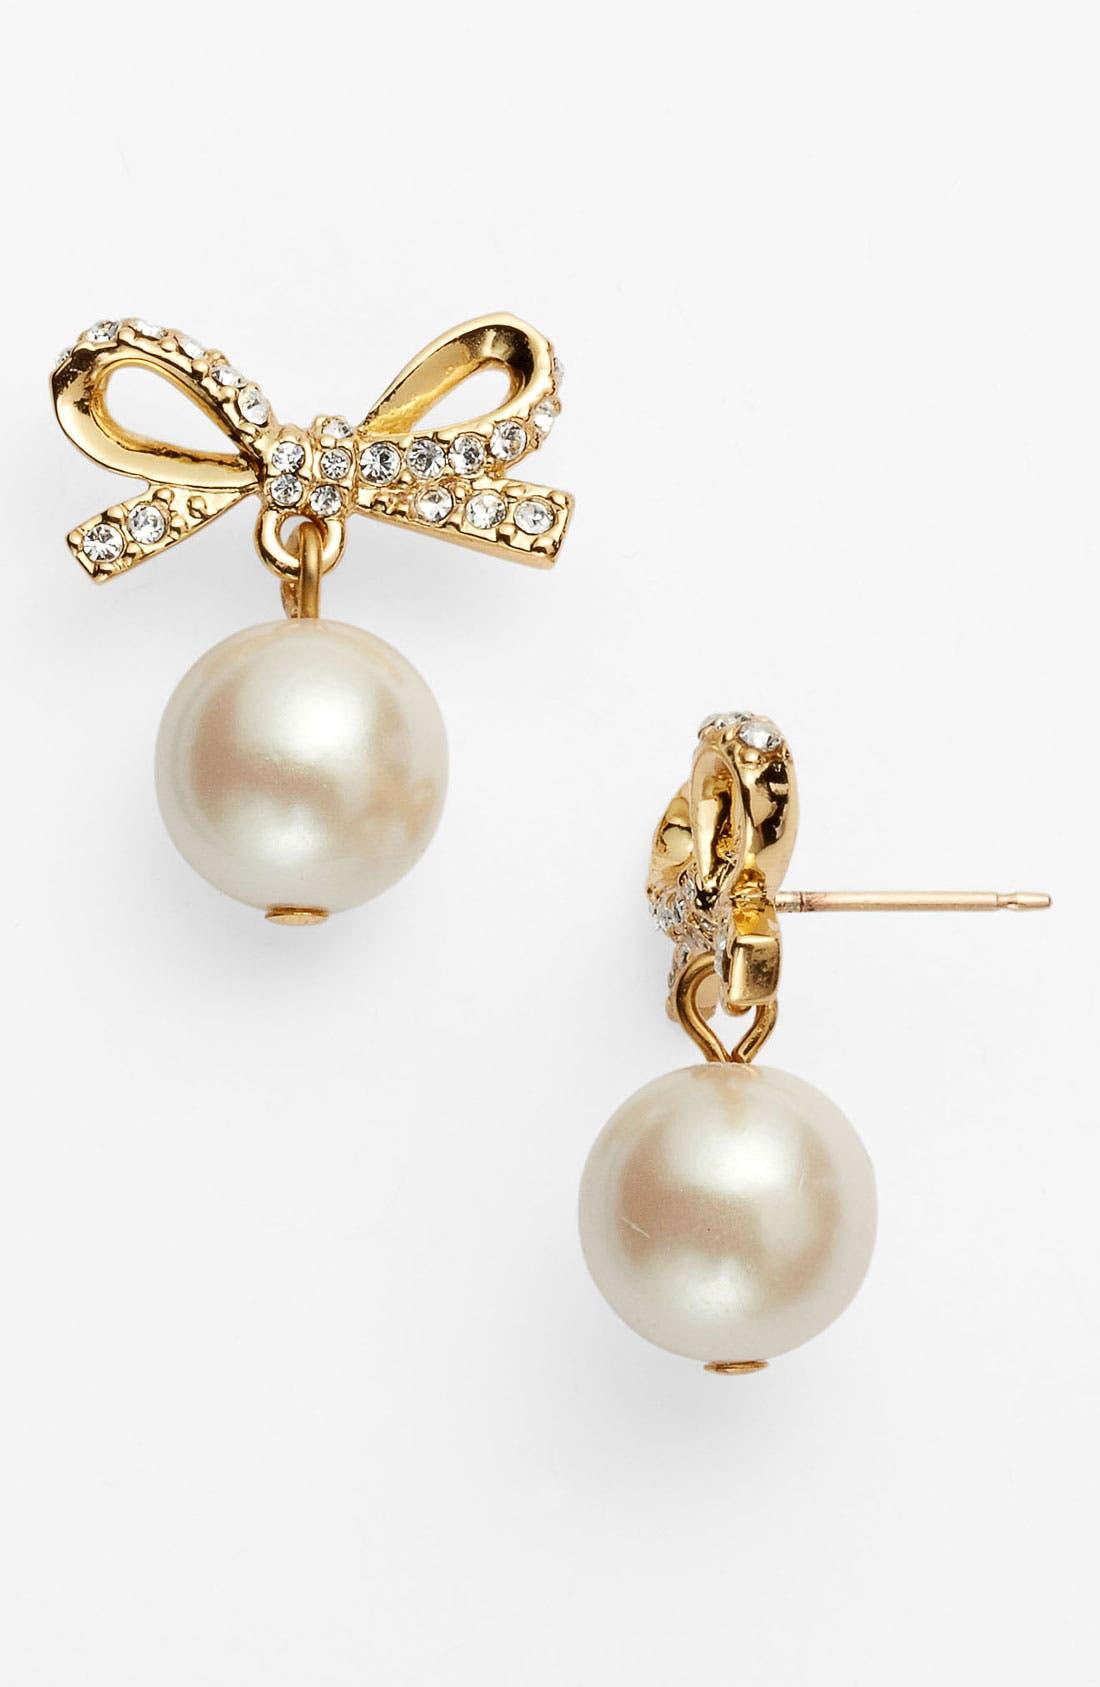 Main Image - kate spade new york 'skinny mini' bow drop earrings